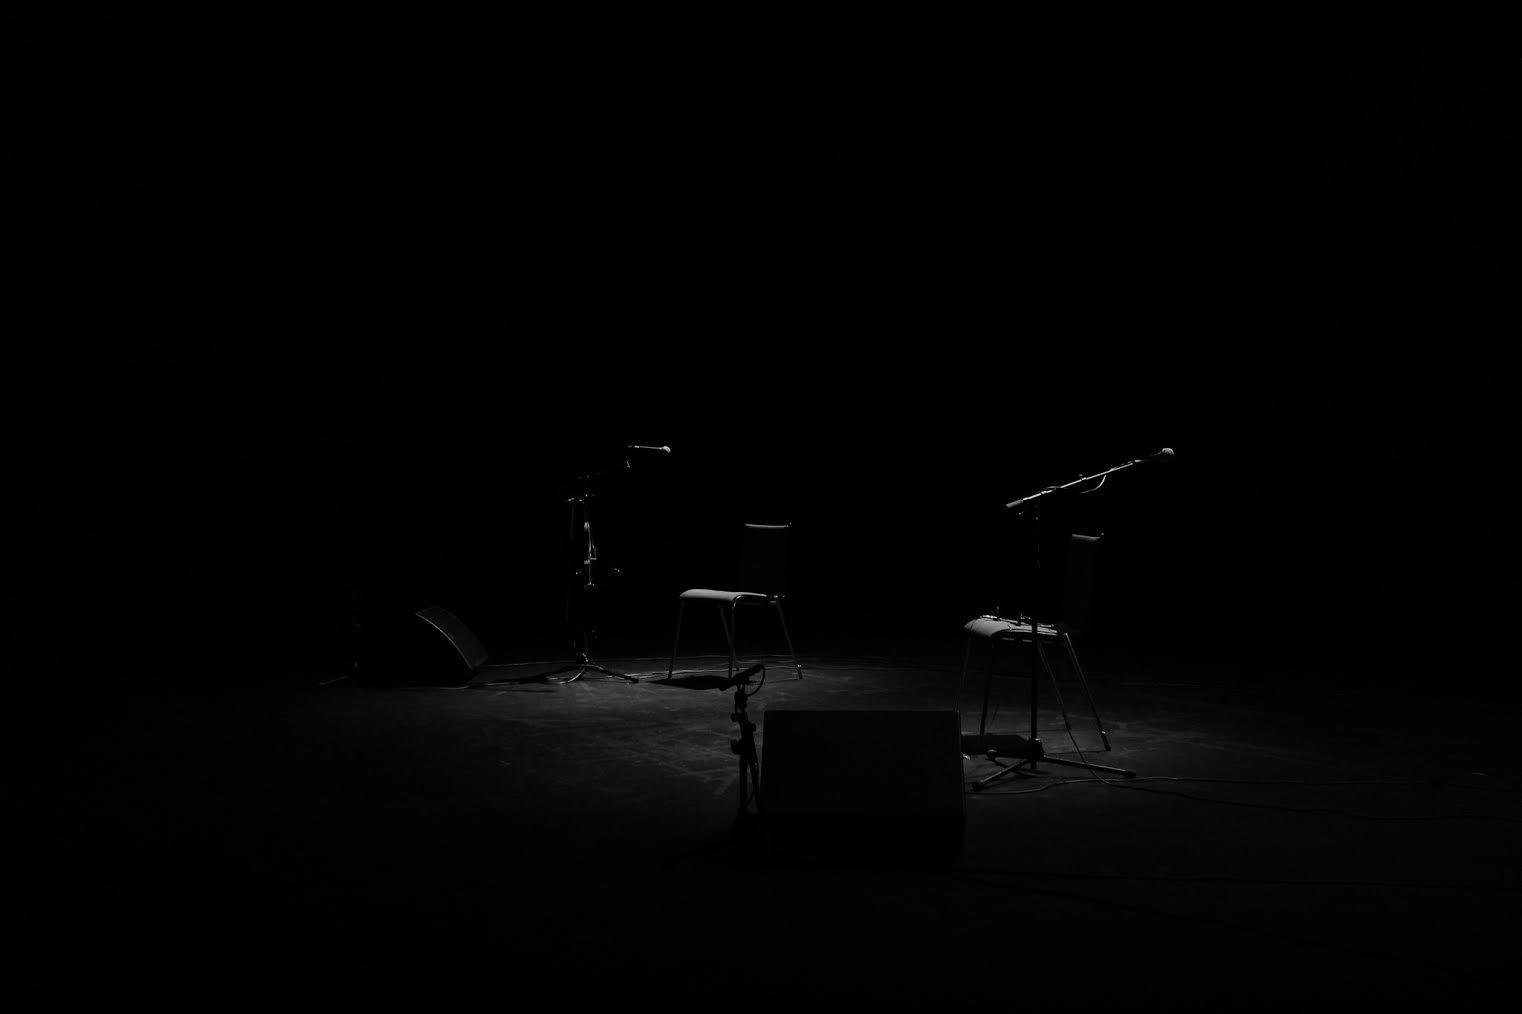 No One, Singing, Scene, Black, Instruments, HQ Photo